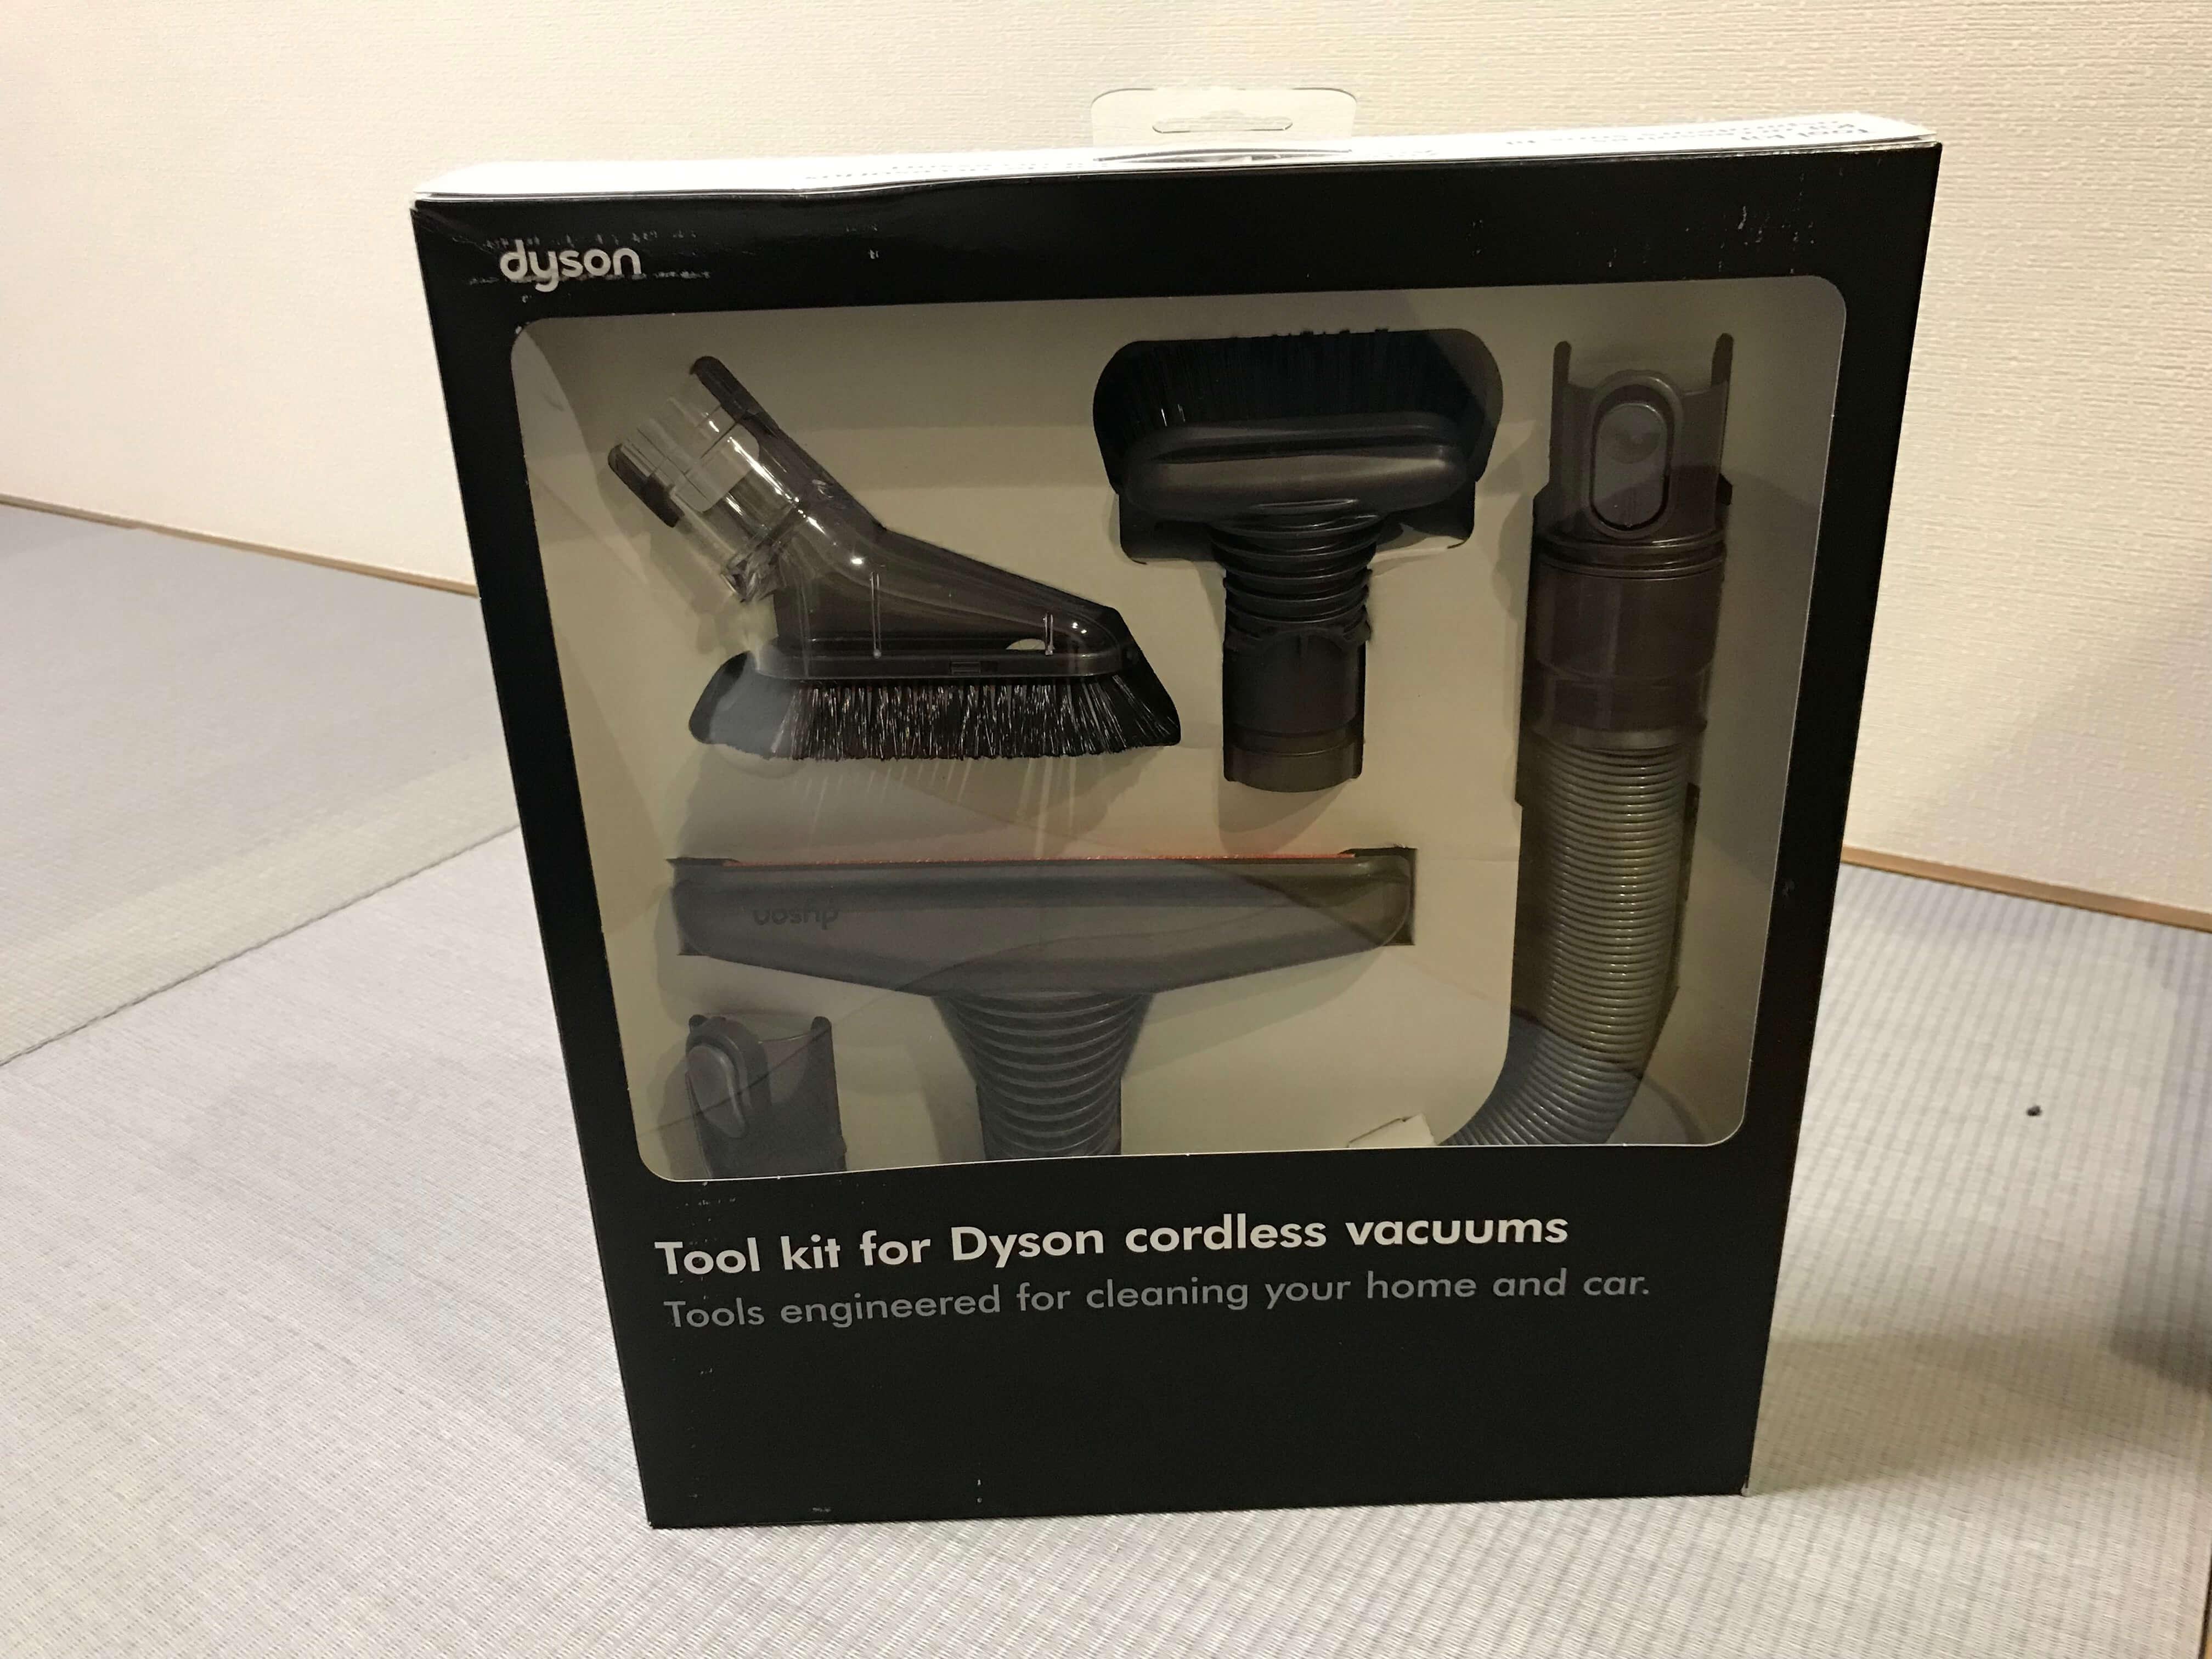 Dyson V6 のツールキット